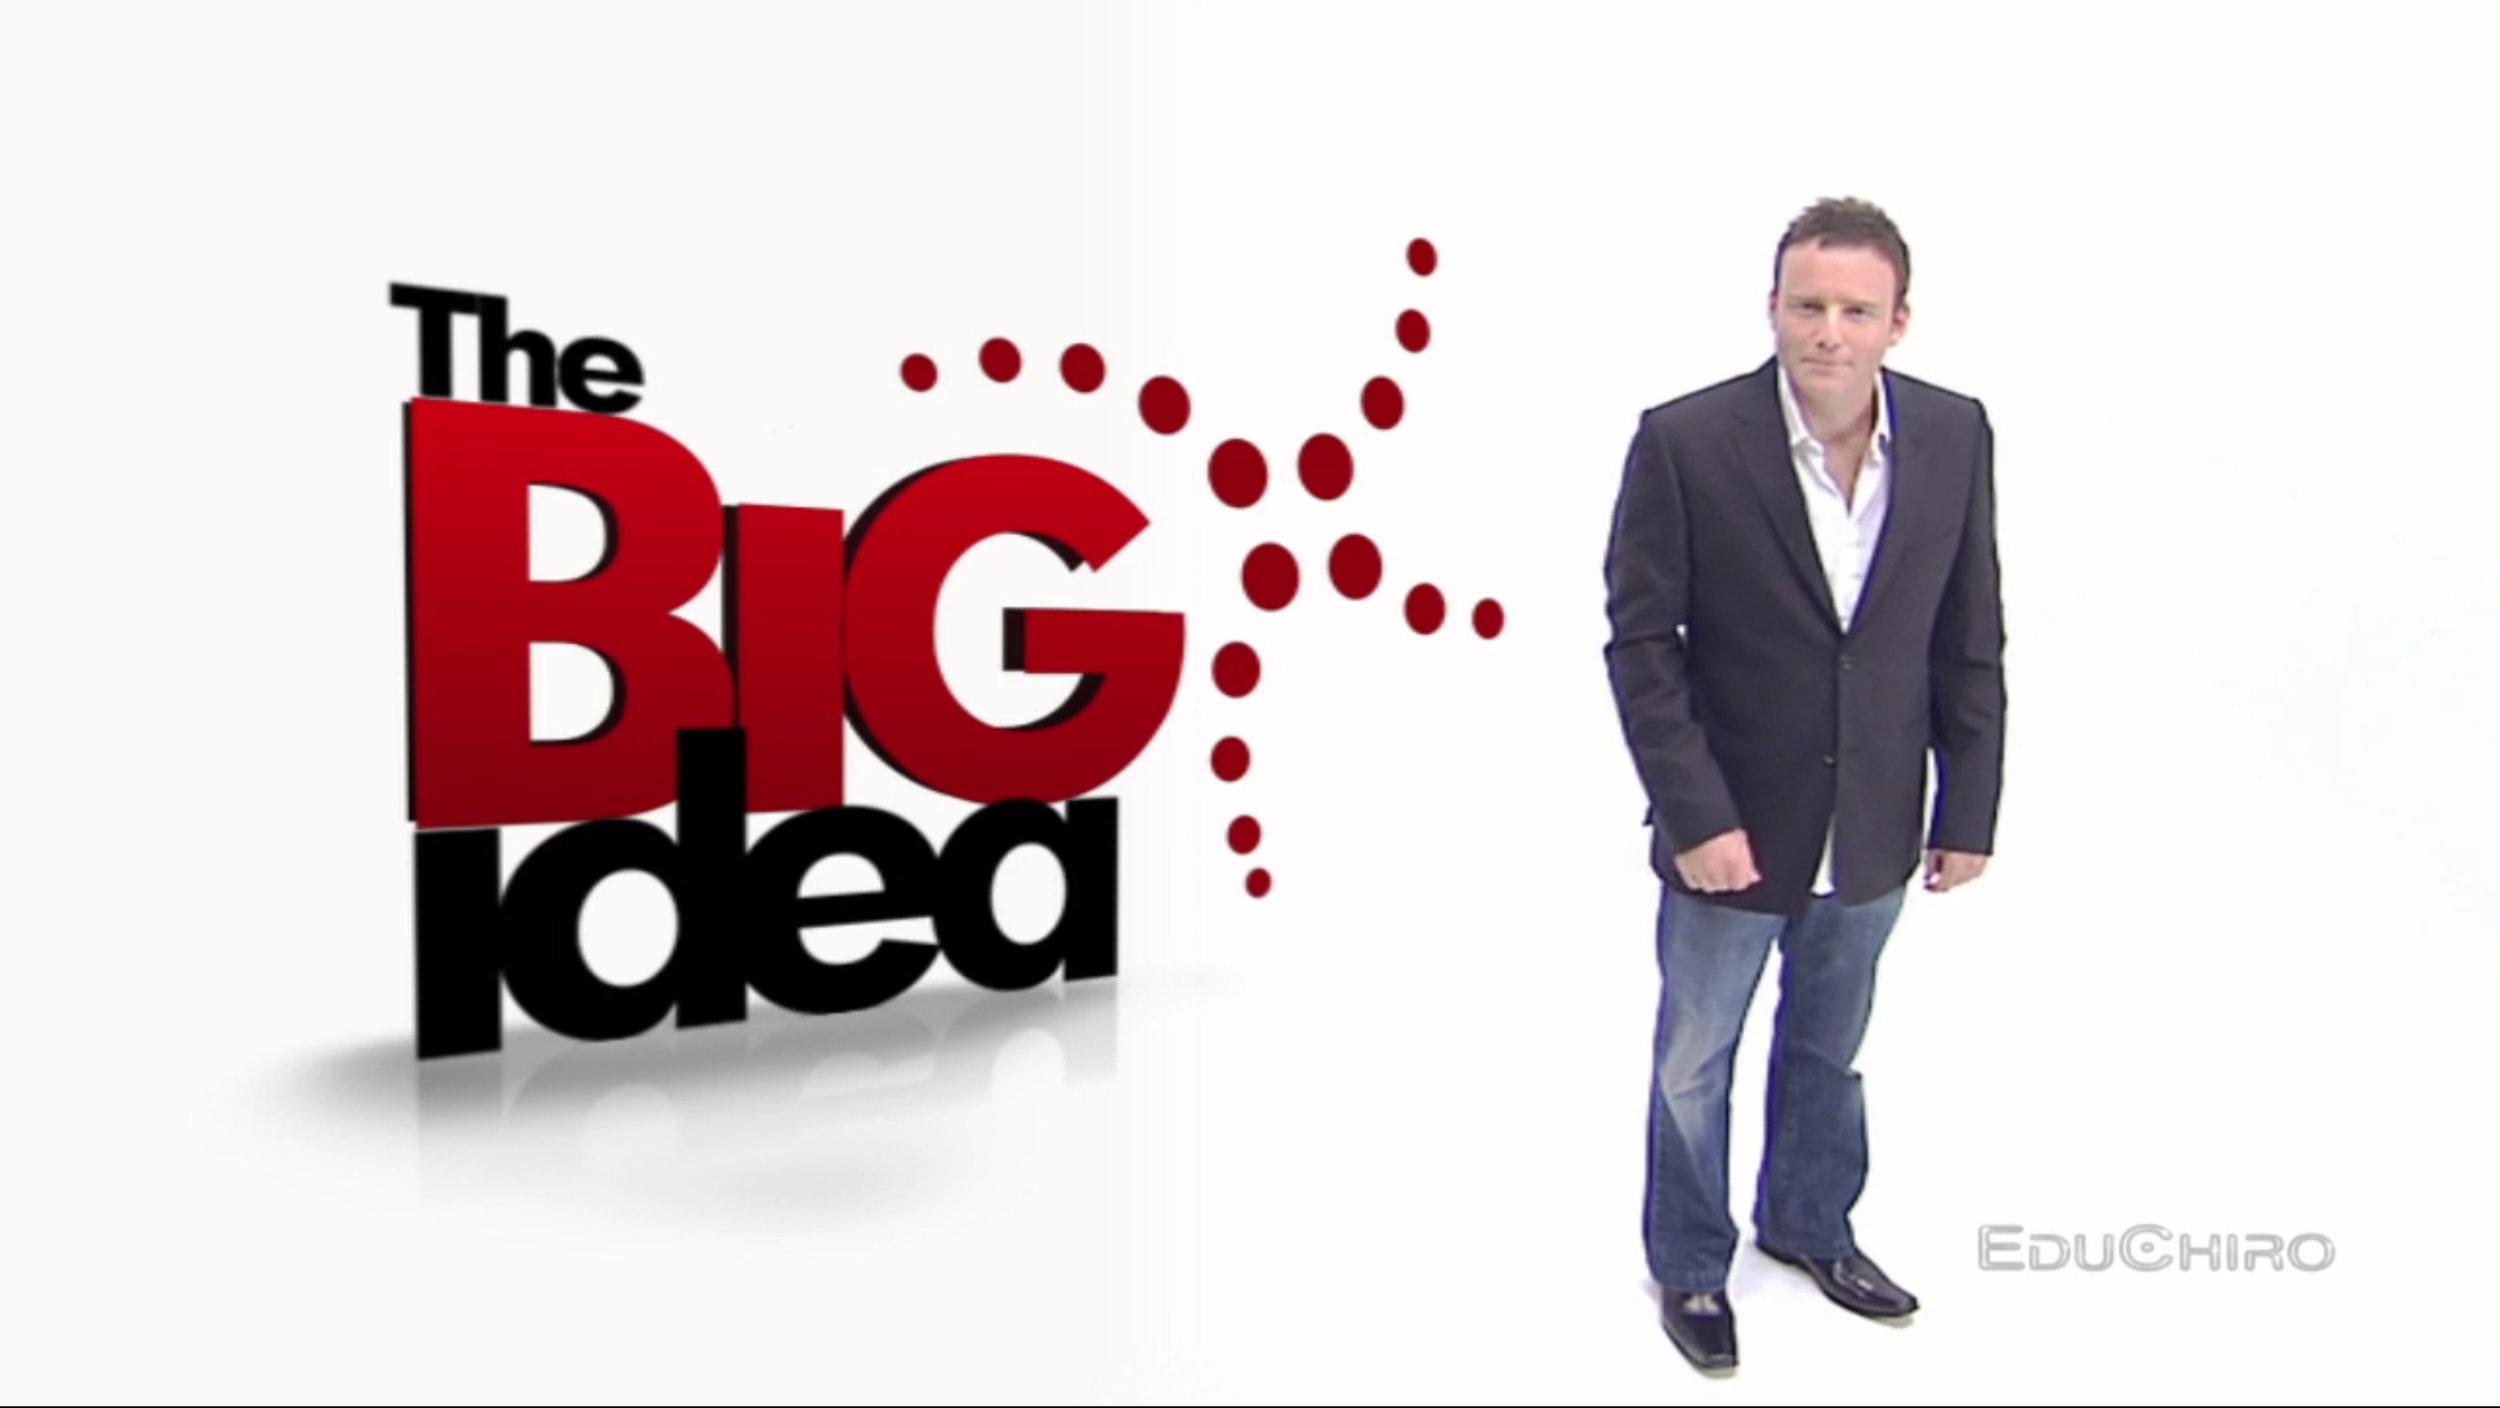 big-idea-video.jpg